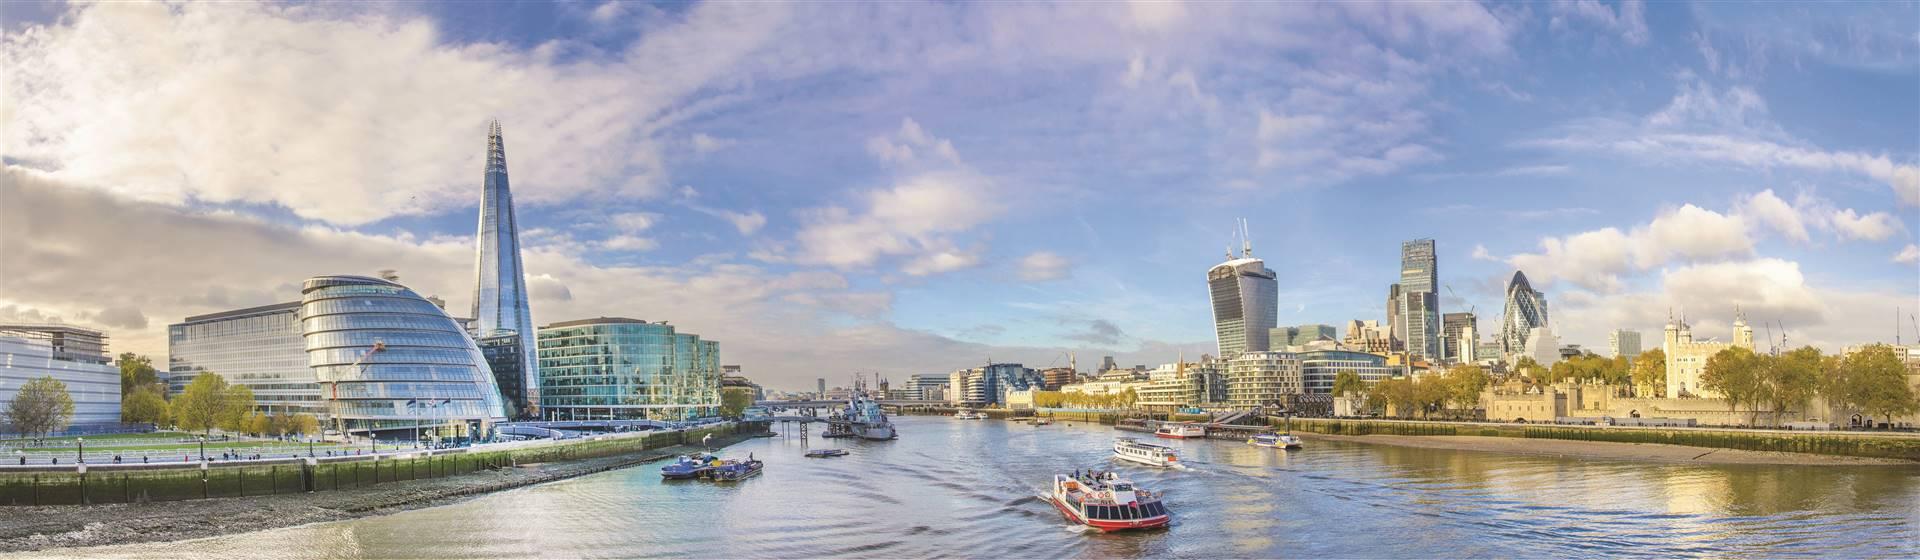 London Chinese New Year/London Shopper 2022